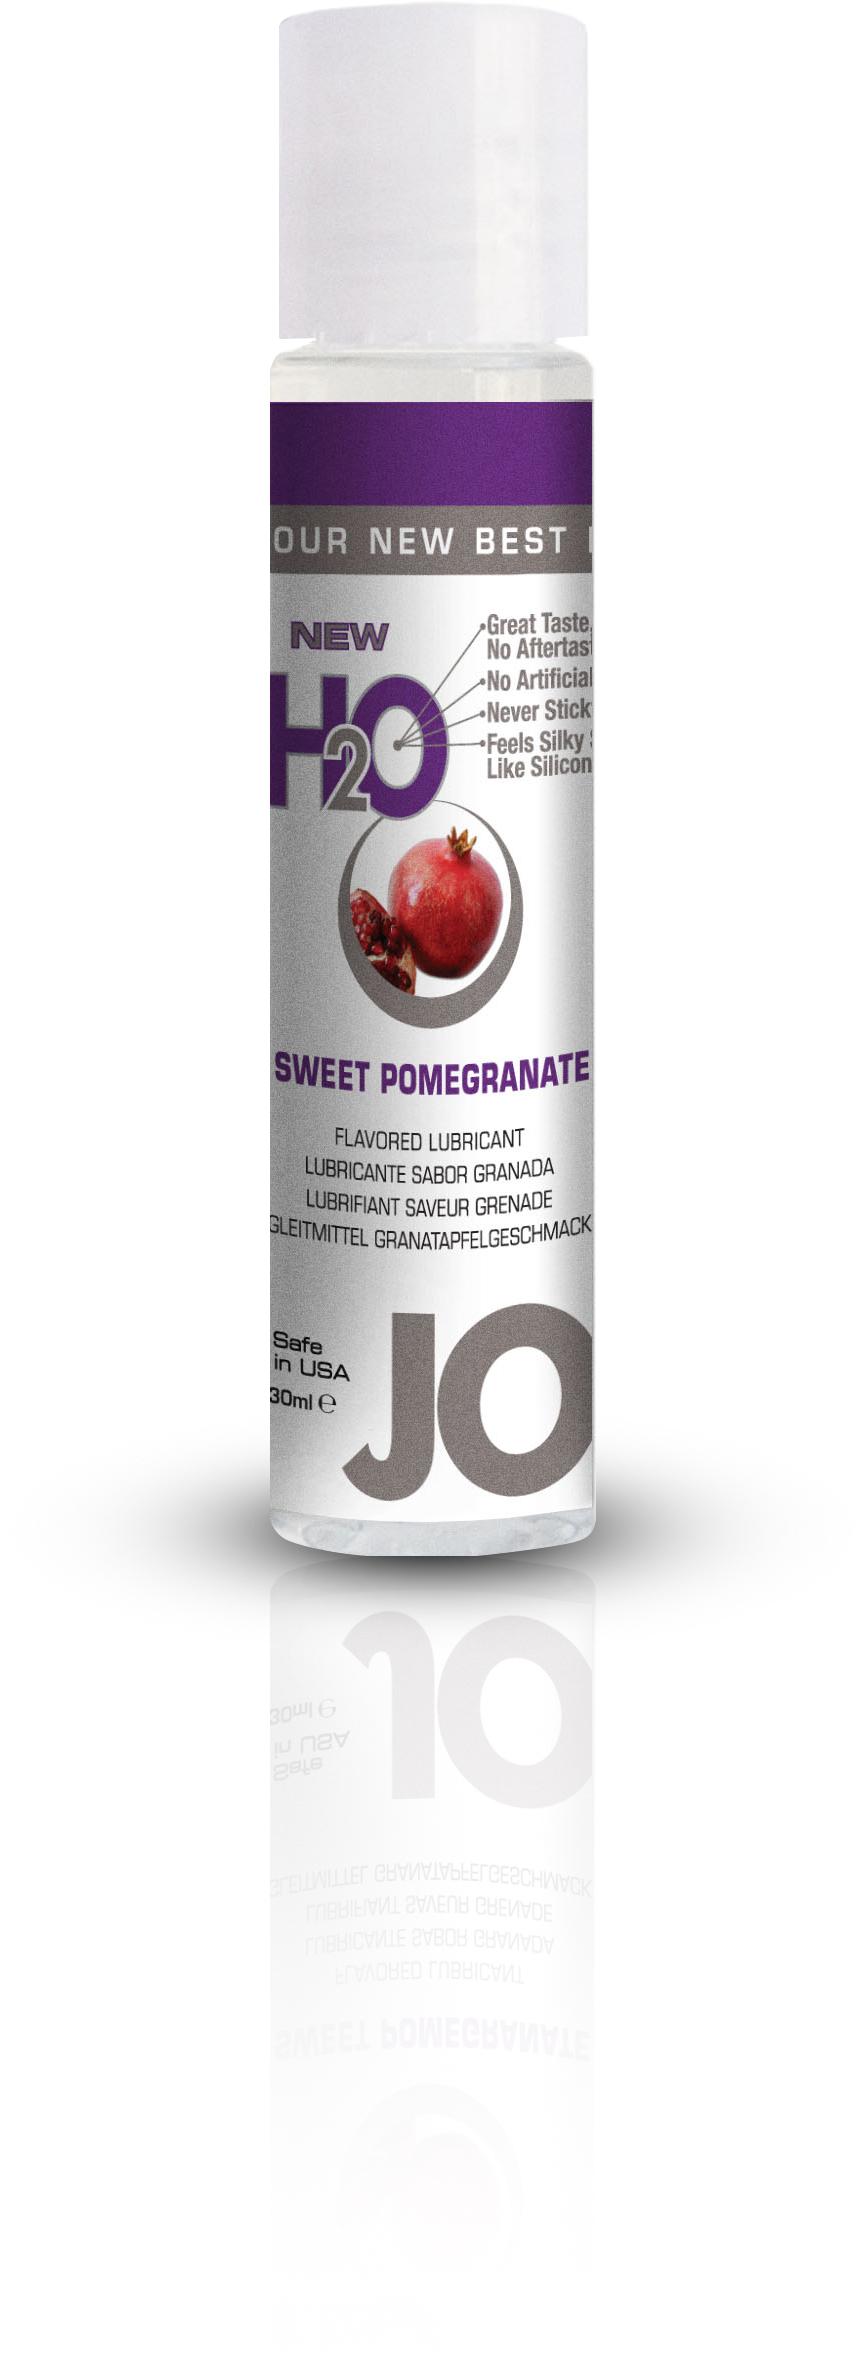 30125_JO_h2o_flavored_lubricant_1oz_1oz_pomegranate.jpg